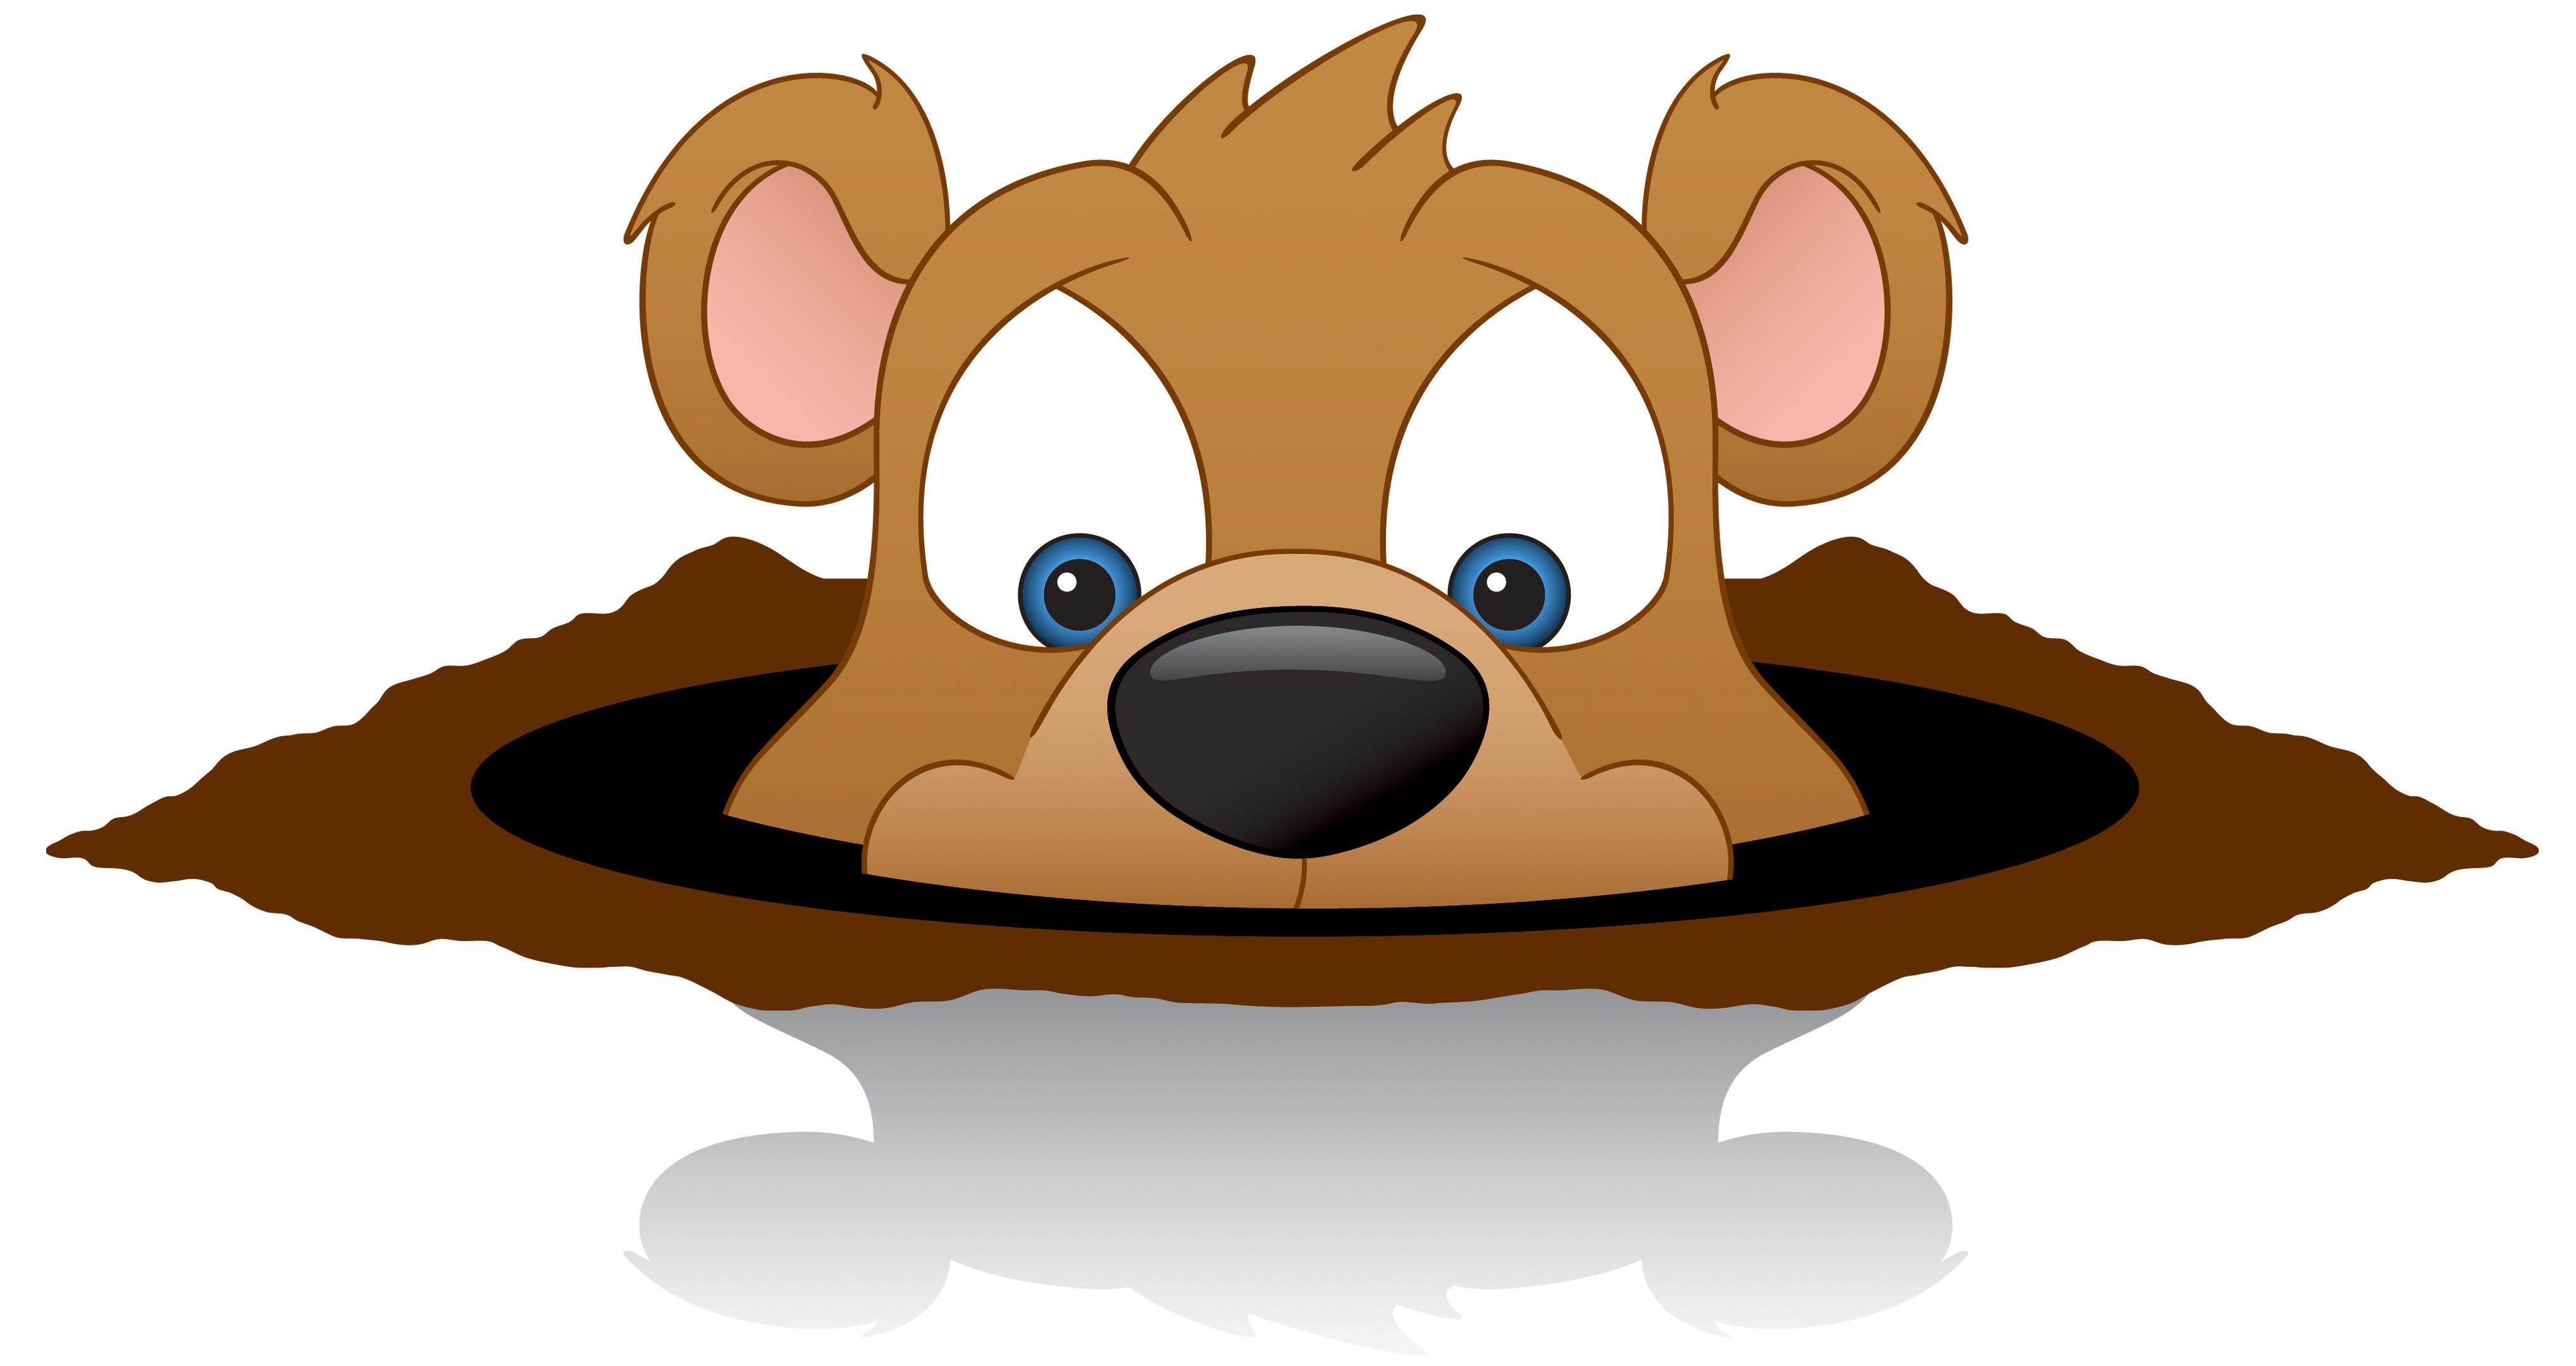 Clip Art Groundhog Clip Art punxsutawney phil clipart kid groundhog day 7 month update inspiredrecovery net